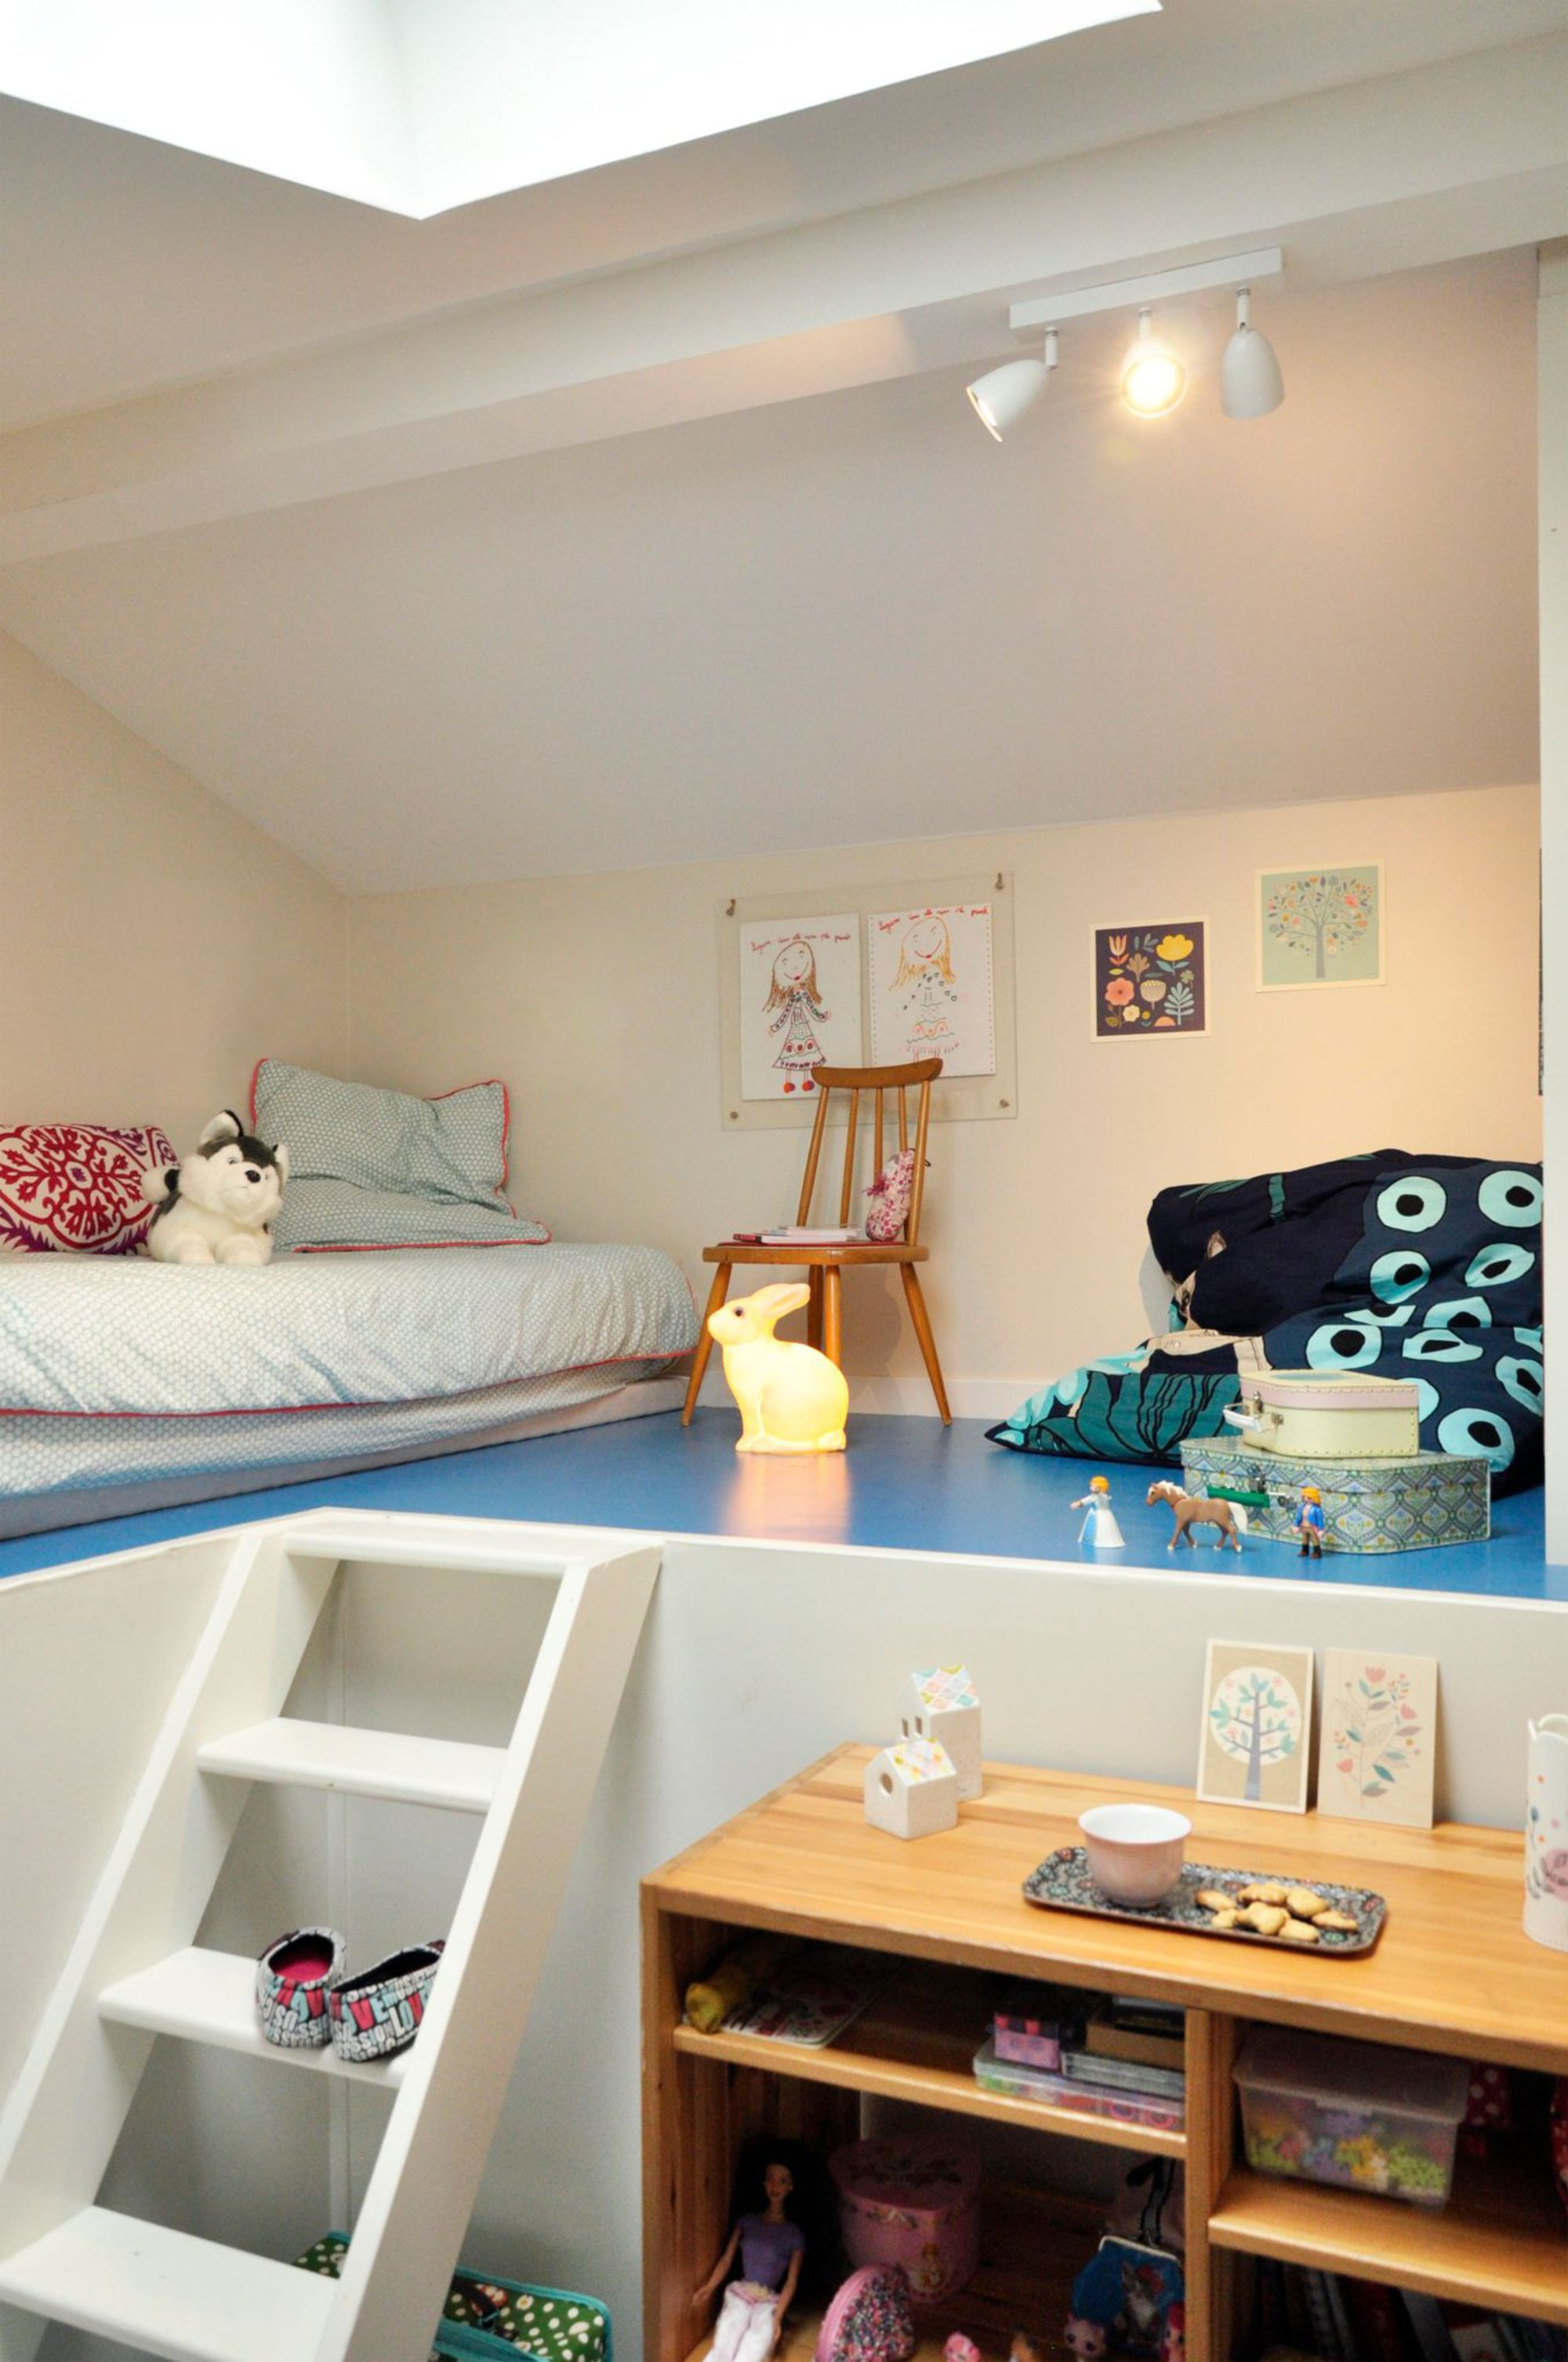 Deco Petite Chambre Enfant petite chambre enfant sous combles | chambre enfant, deco